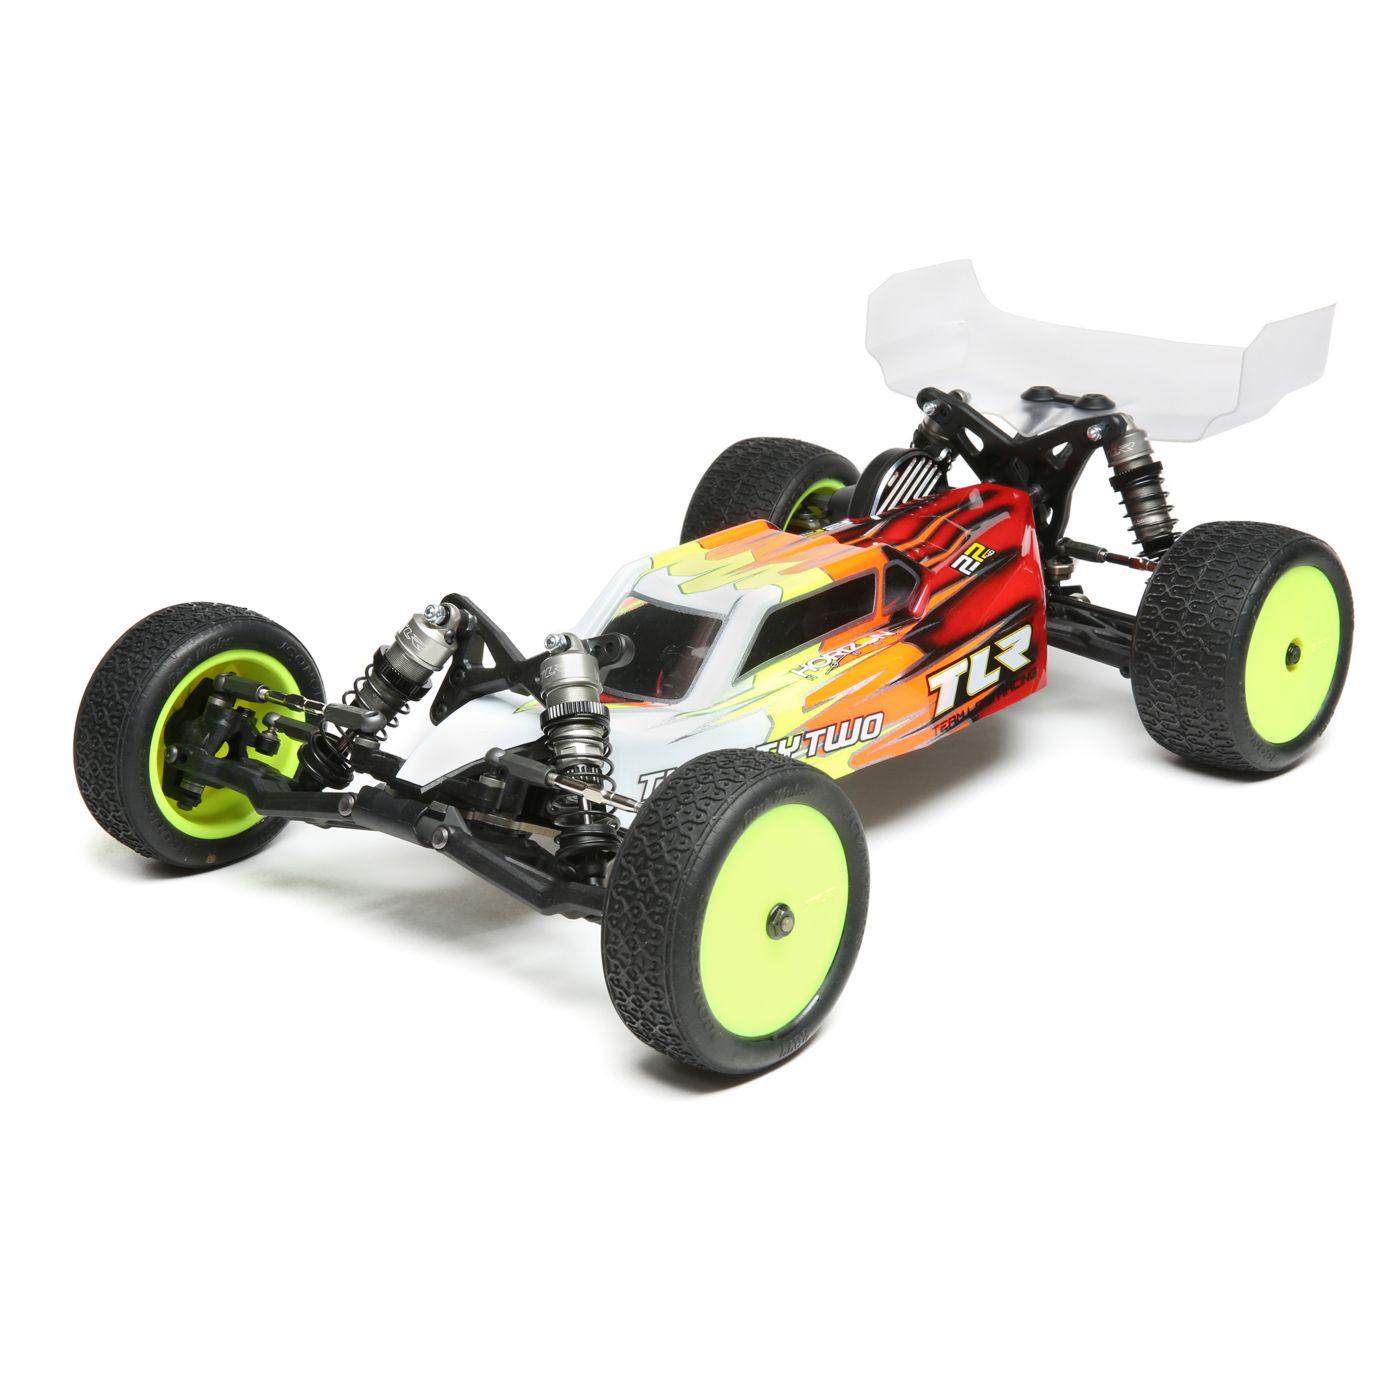 Team Losi Racing 22 4.0 2WD R/C Buggy Kit